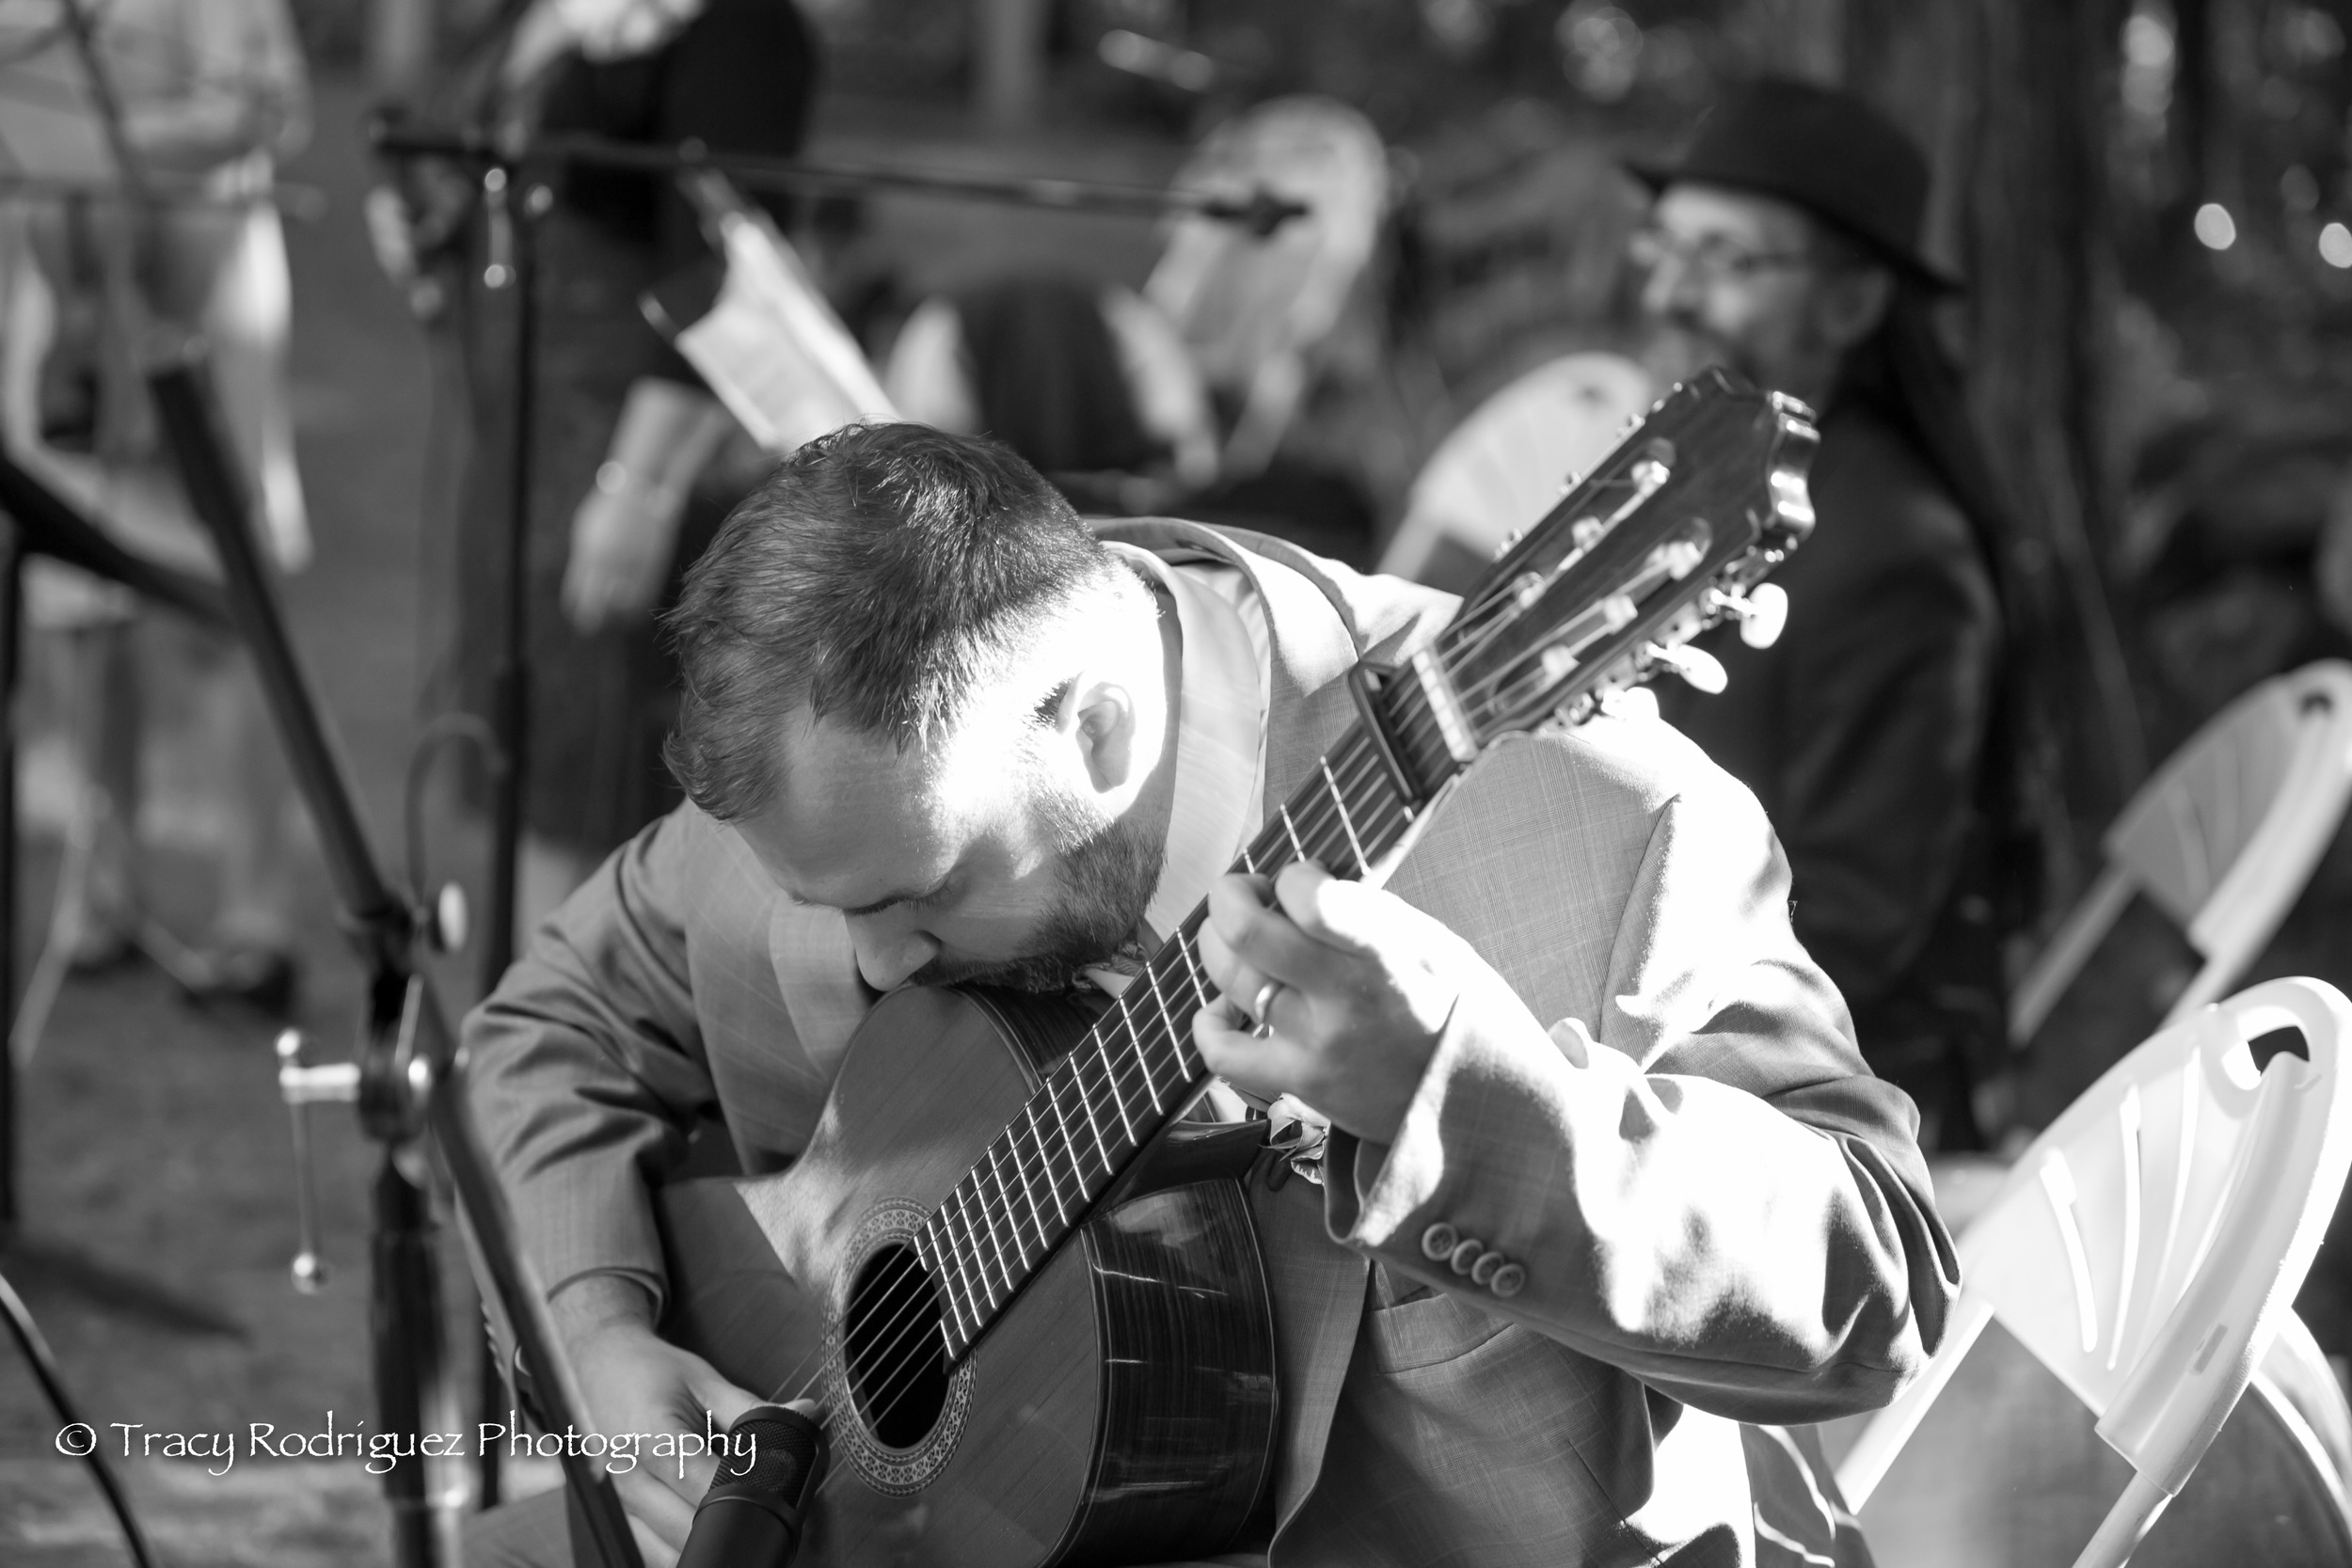 Tracy_Rodriguez_Photography_Blog-1675.jpg